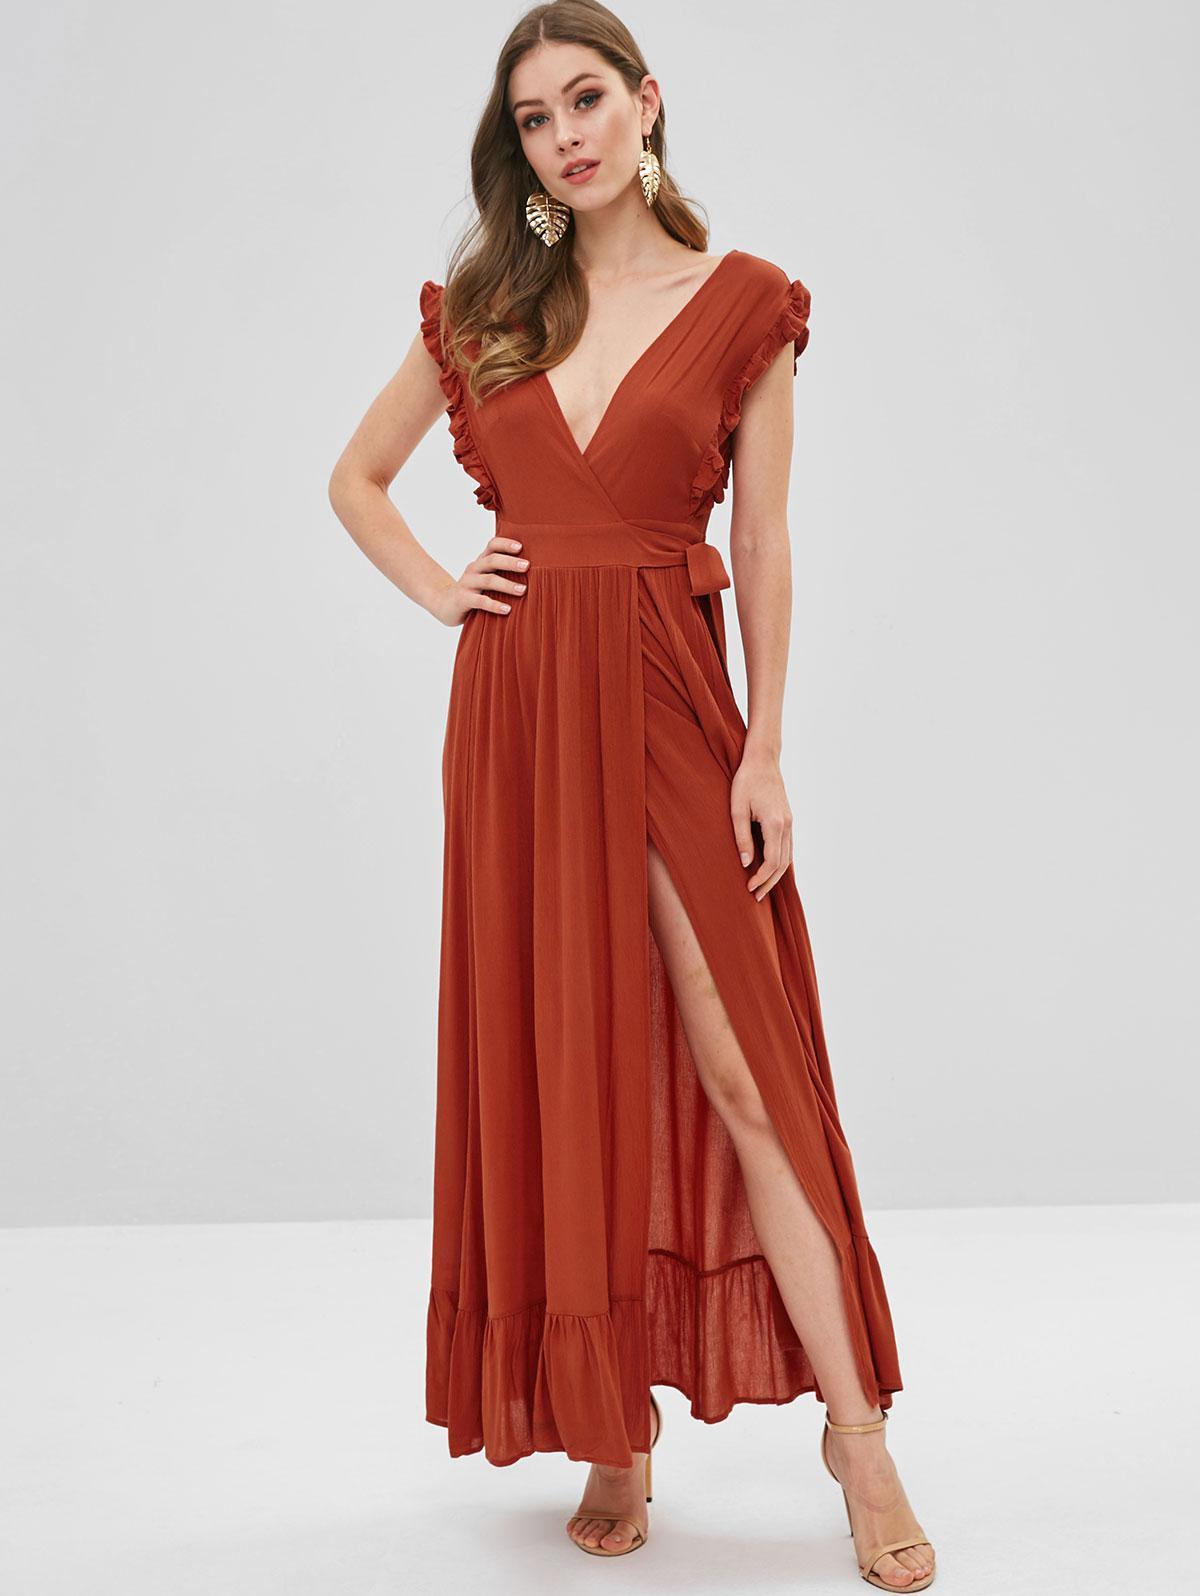 Ruffles Wrap Maxi Dress, Orange salmon